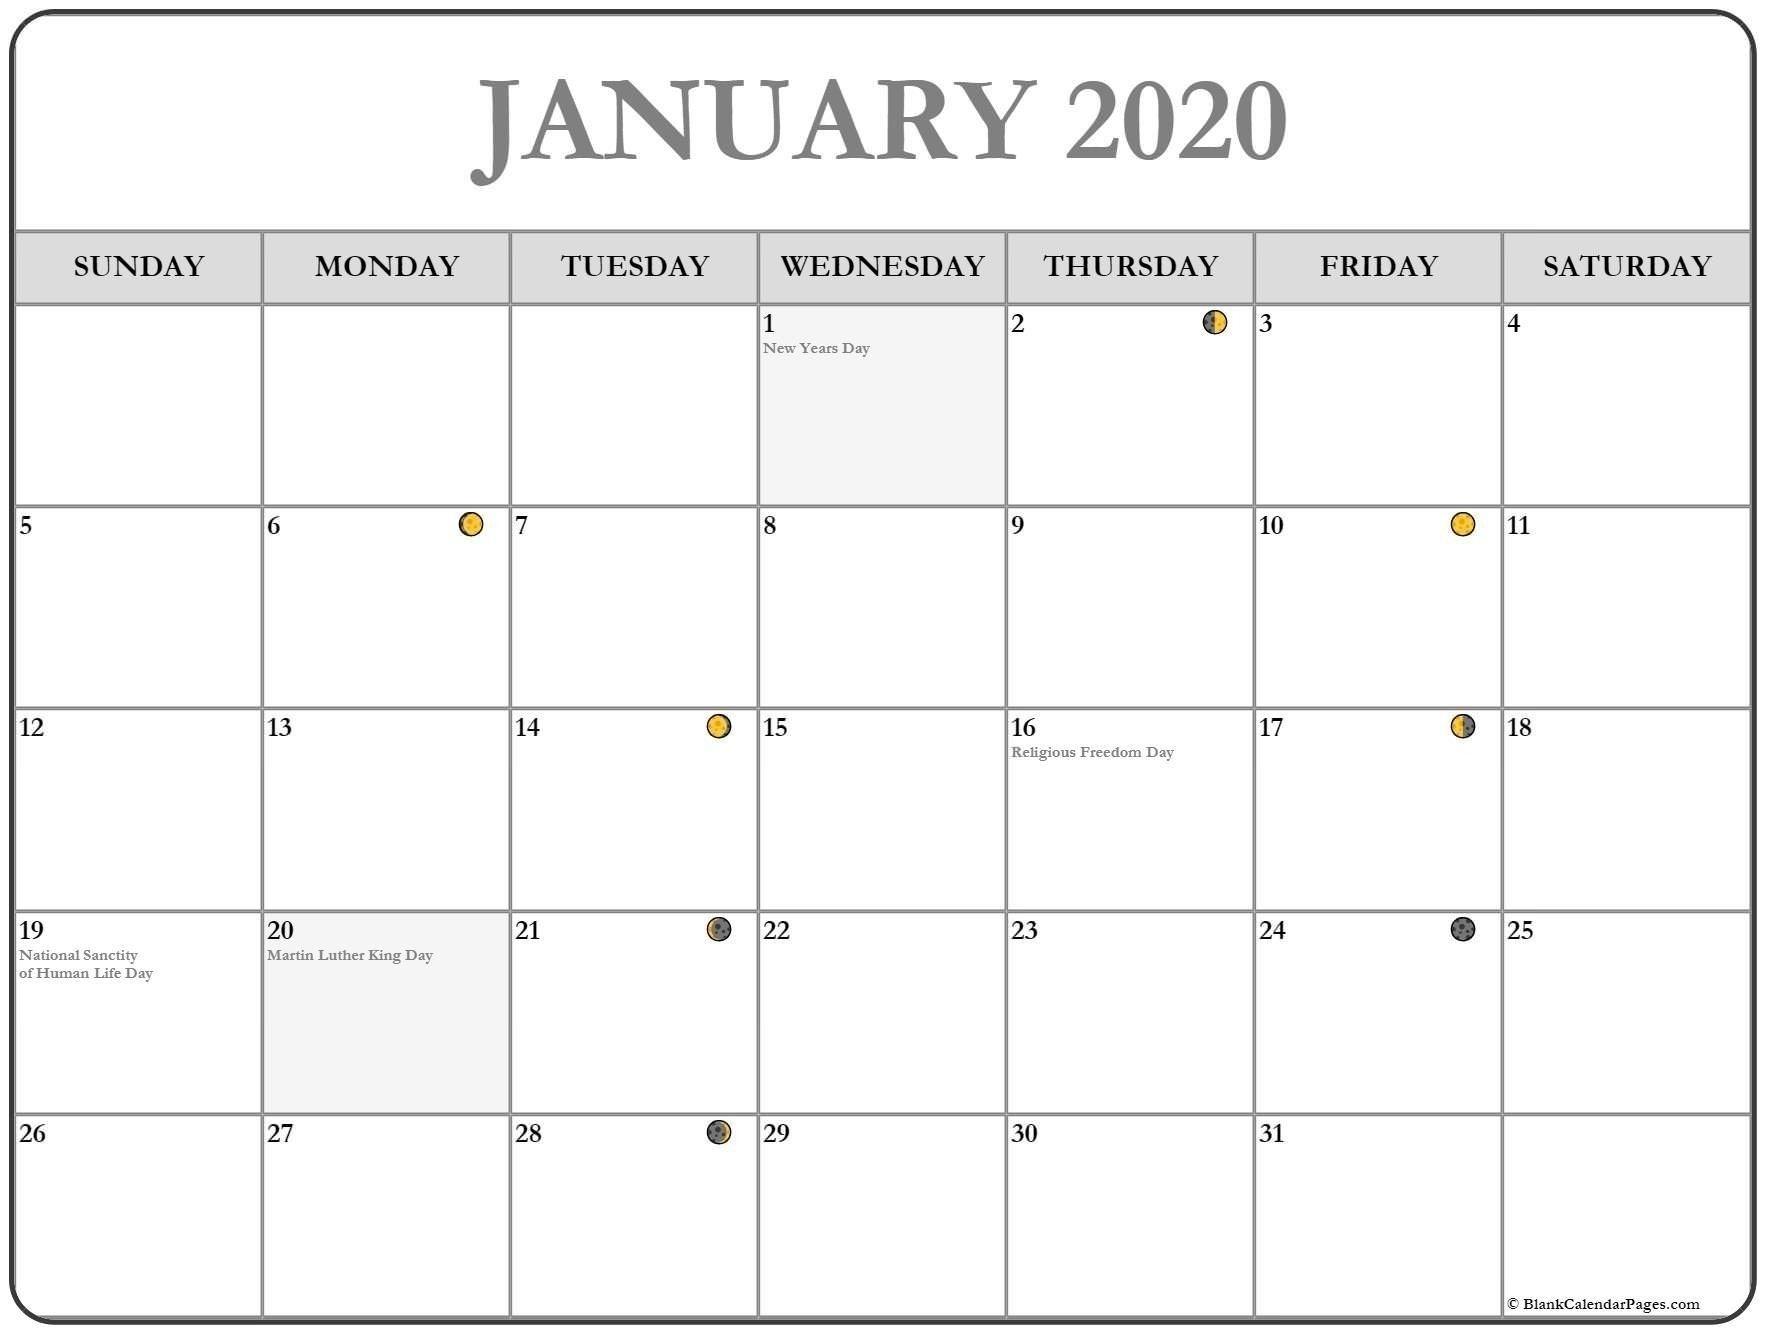 January 2020 Lunar Calendar | Monthly Calendar Template